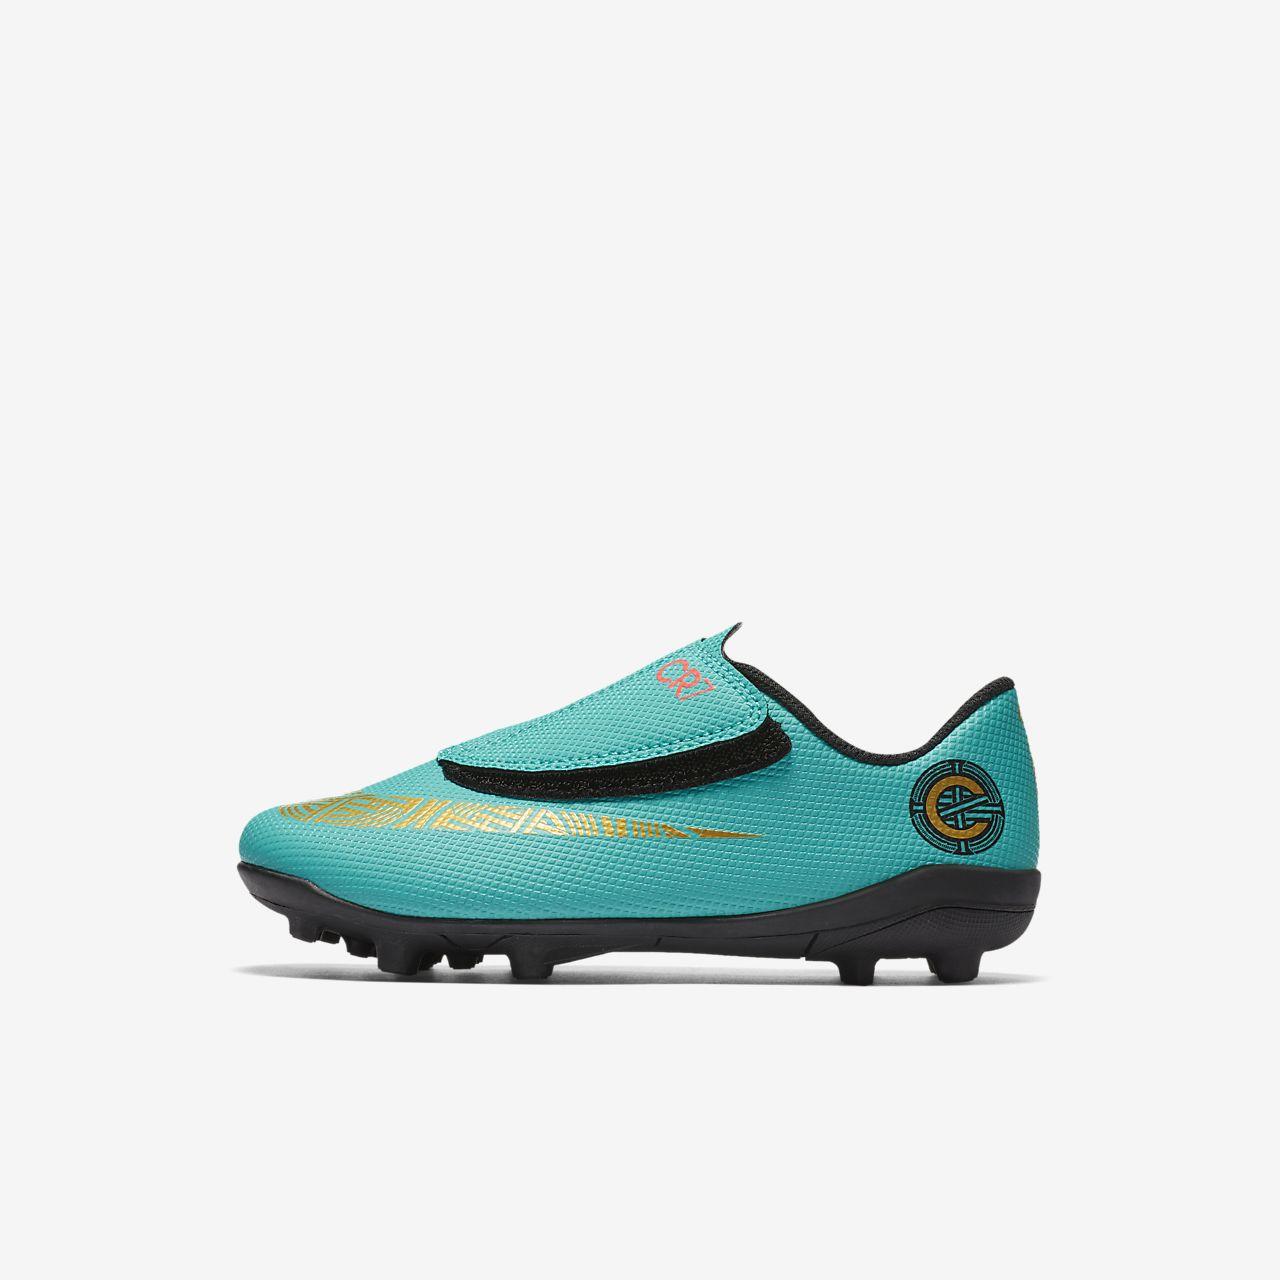 Ronaldo Nike Cristiano Chaussures Louboutin Xii Pour Les Hommes kdnSWnqIXq